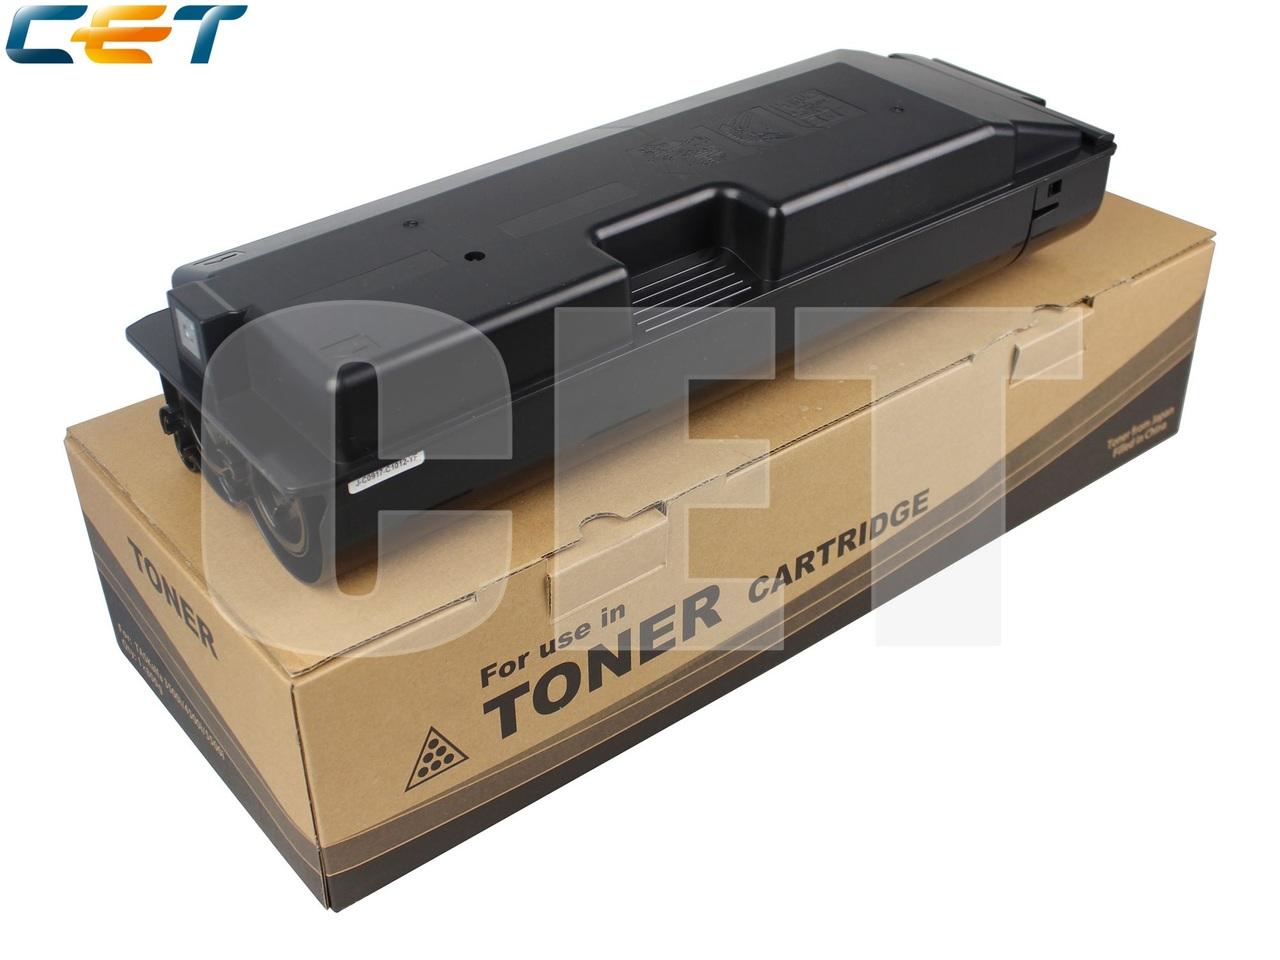 Тонер-картридж TK-6305 для KYOCERA TASKalfa3500i/4500i/5500i/3501i/4501i/5501i (CET), 800г, 35000 стр.,CET8193